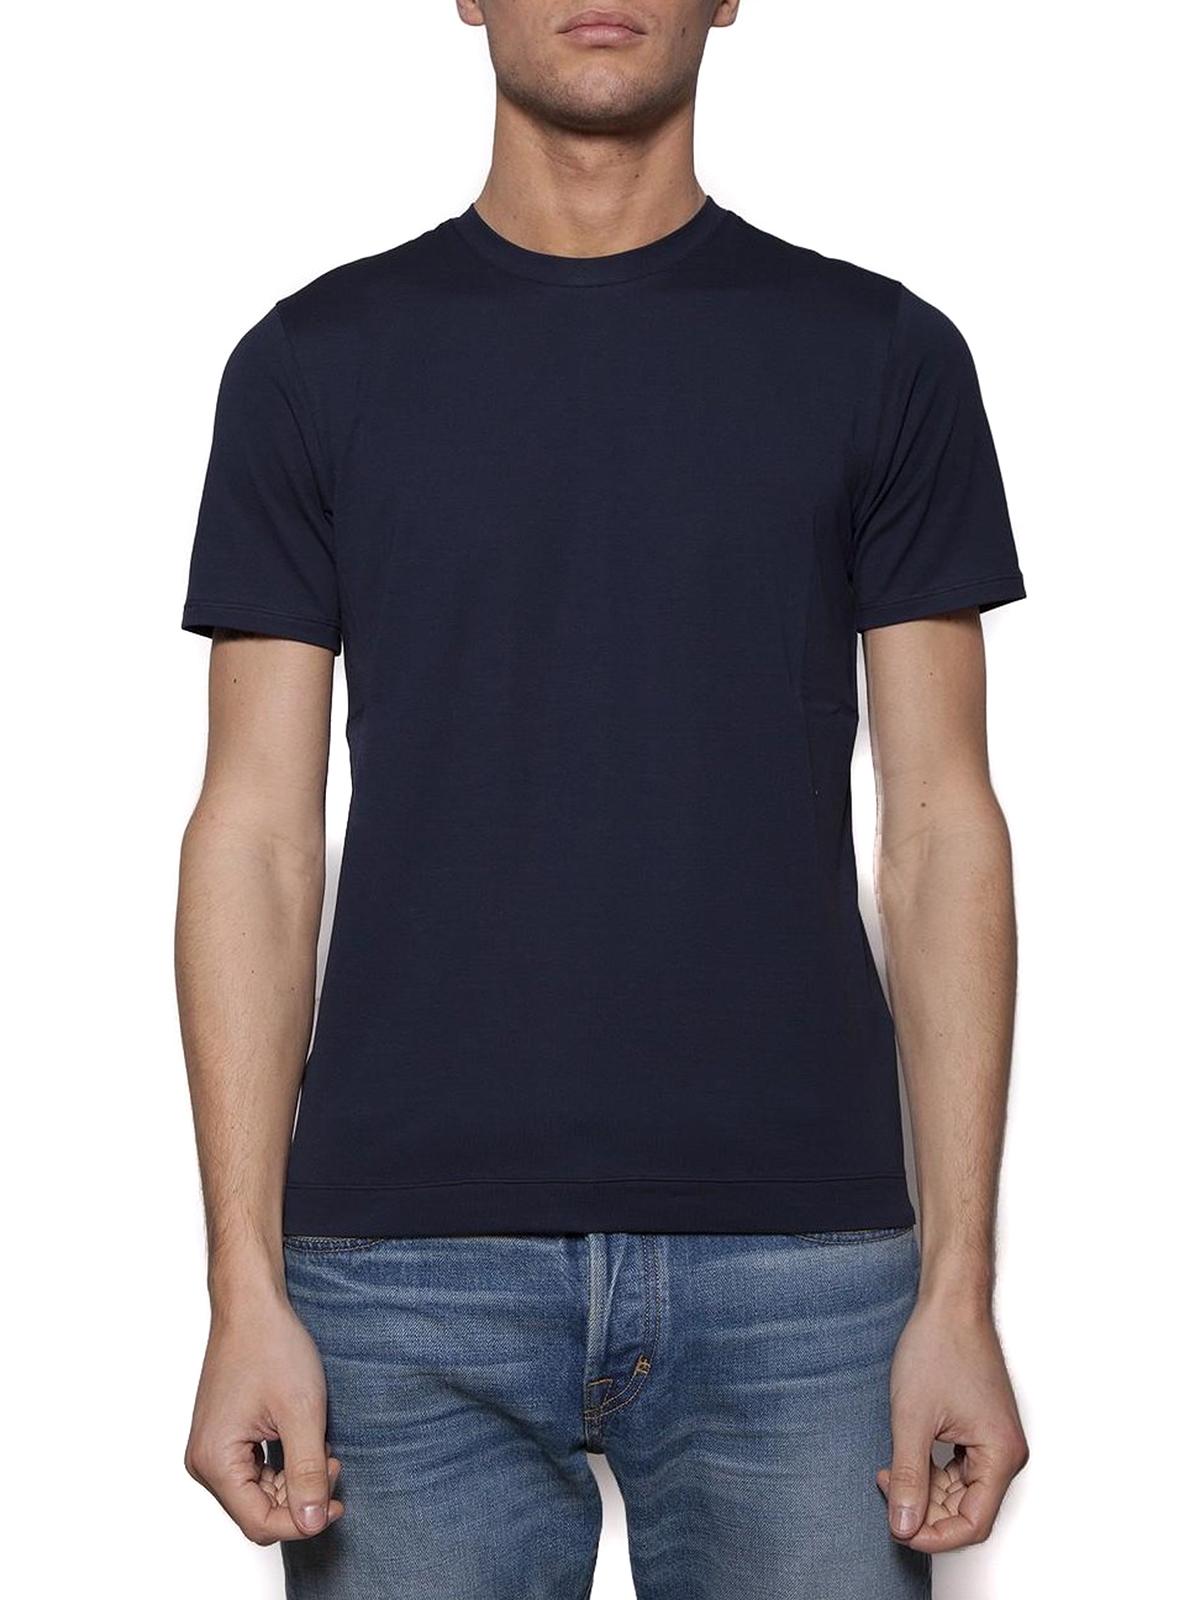 Dark blue stretch jersey t shirt by cruciani t shirts for T shirt dark blue